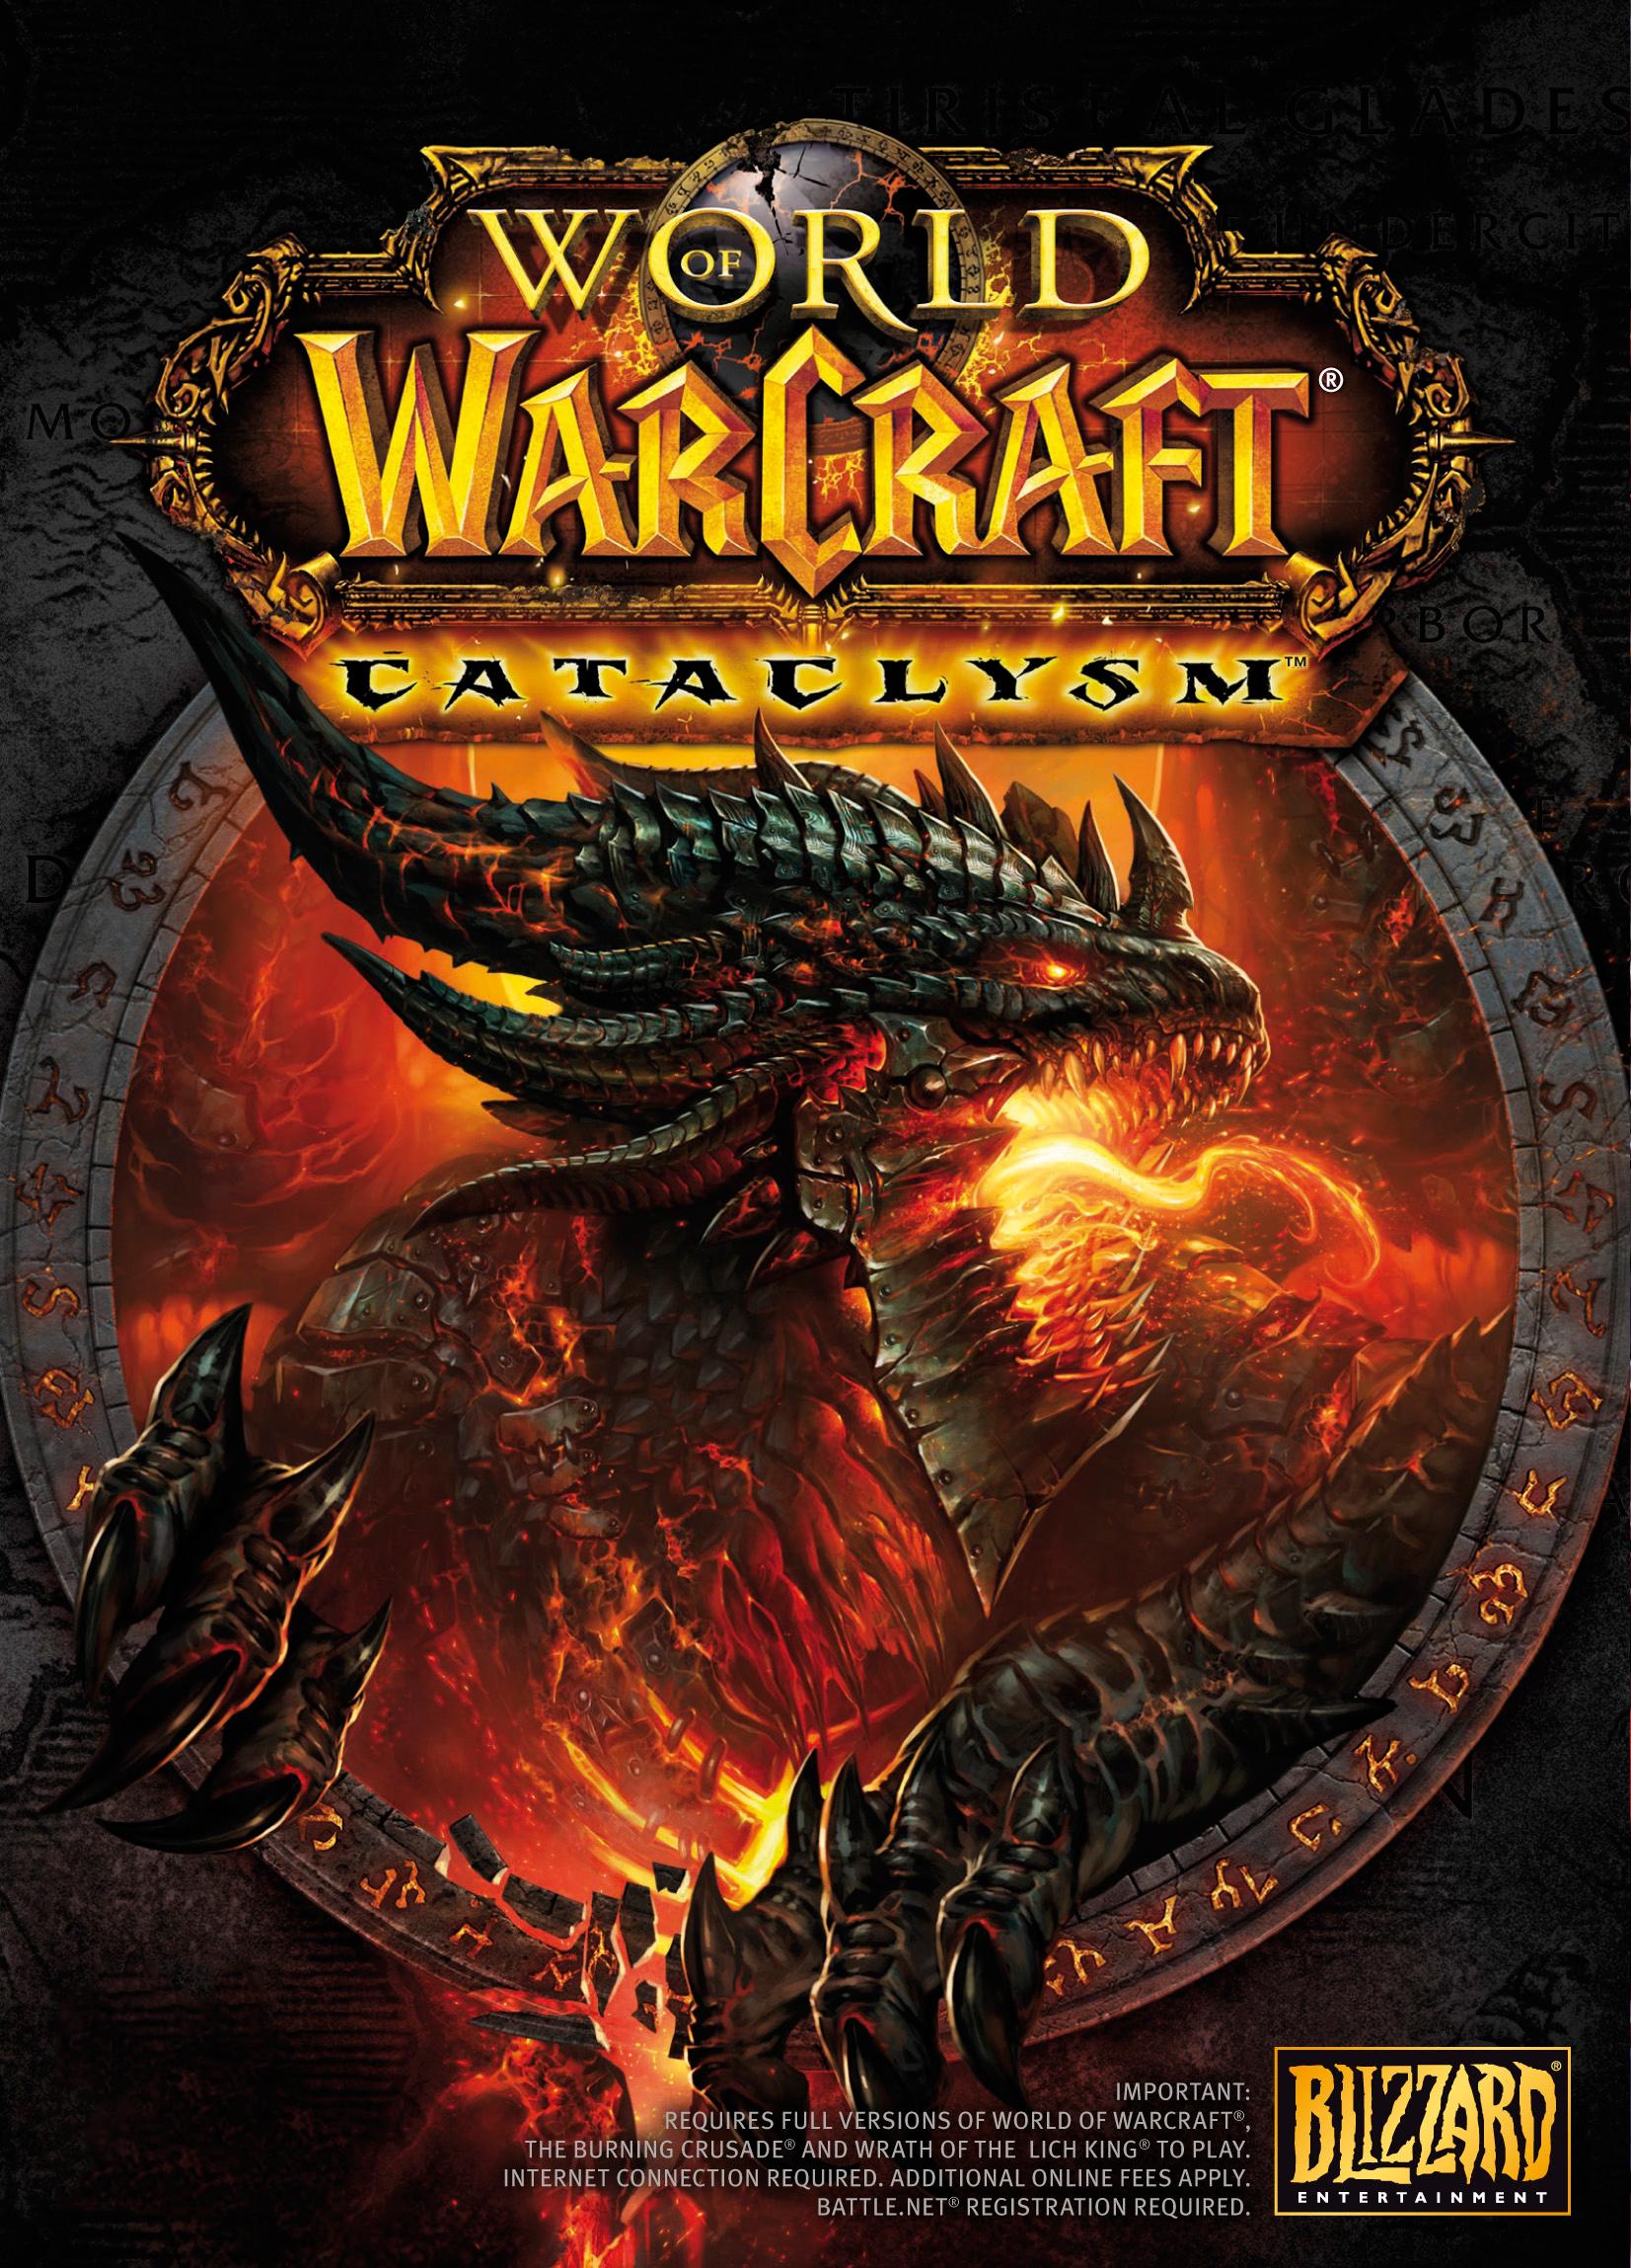 world of warcraft cataclysm cover artjpg